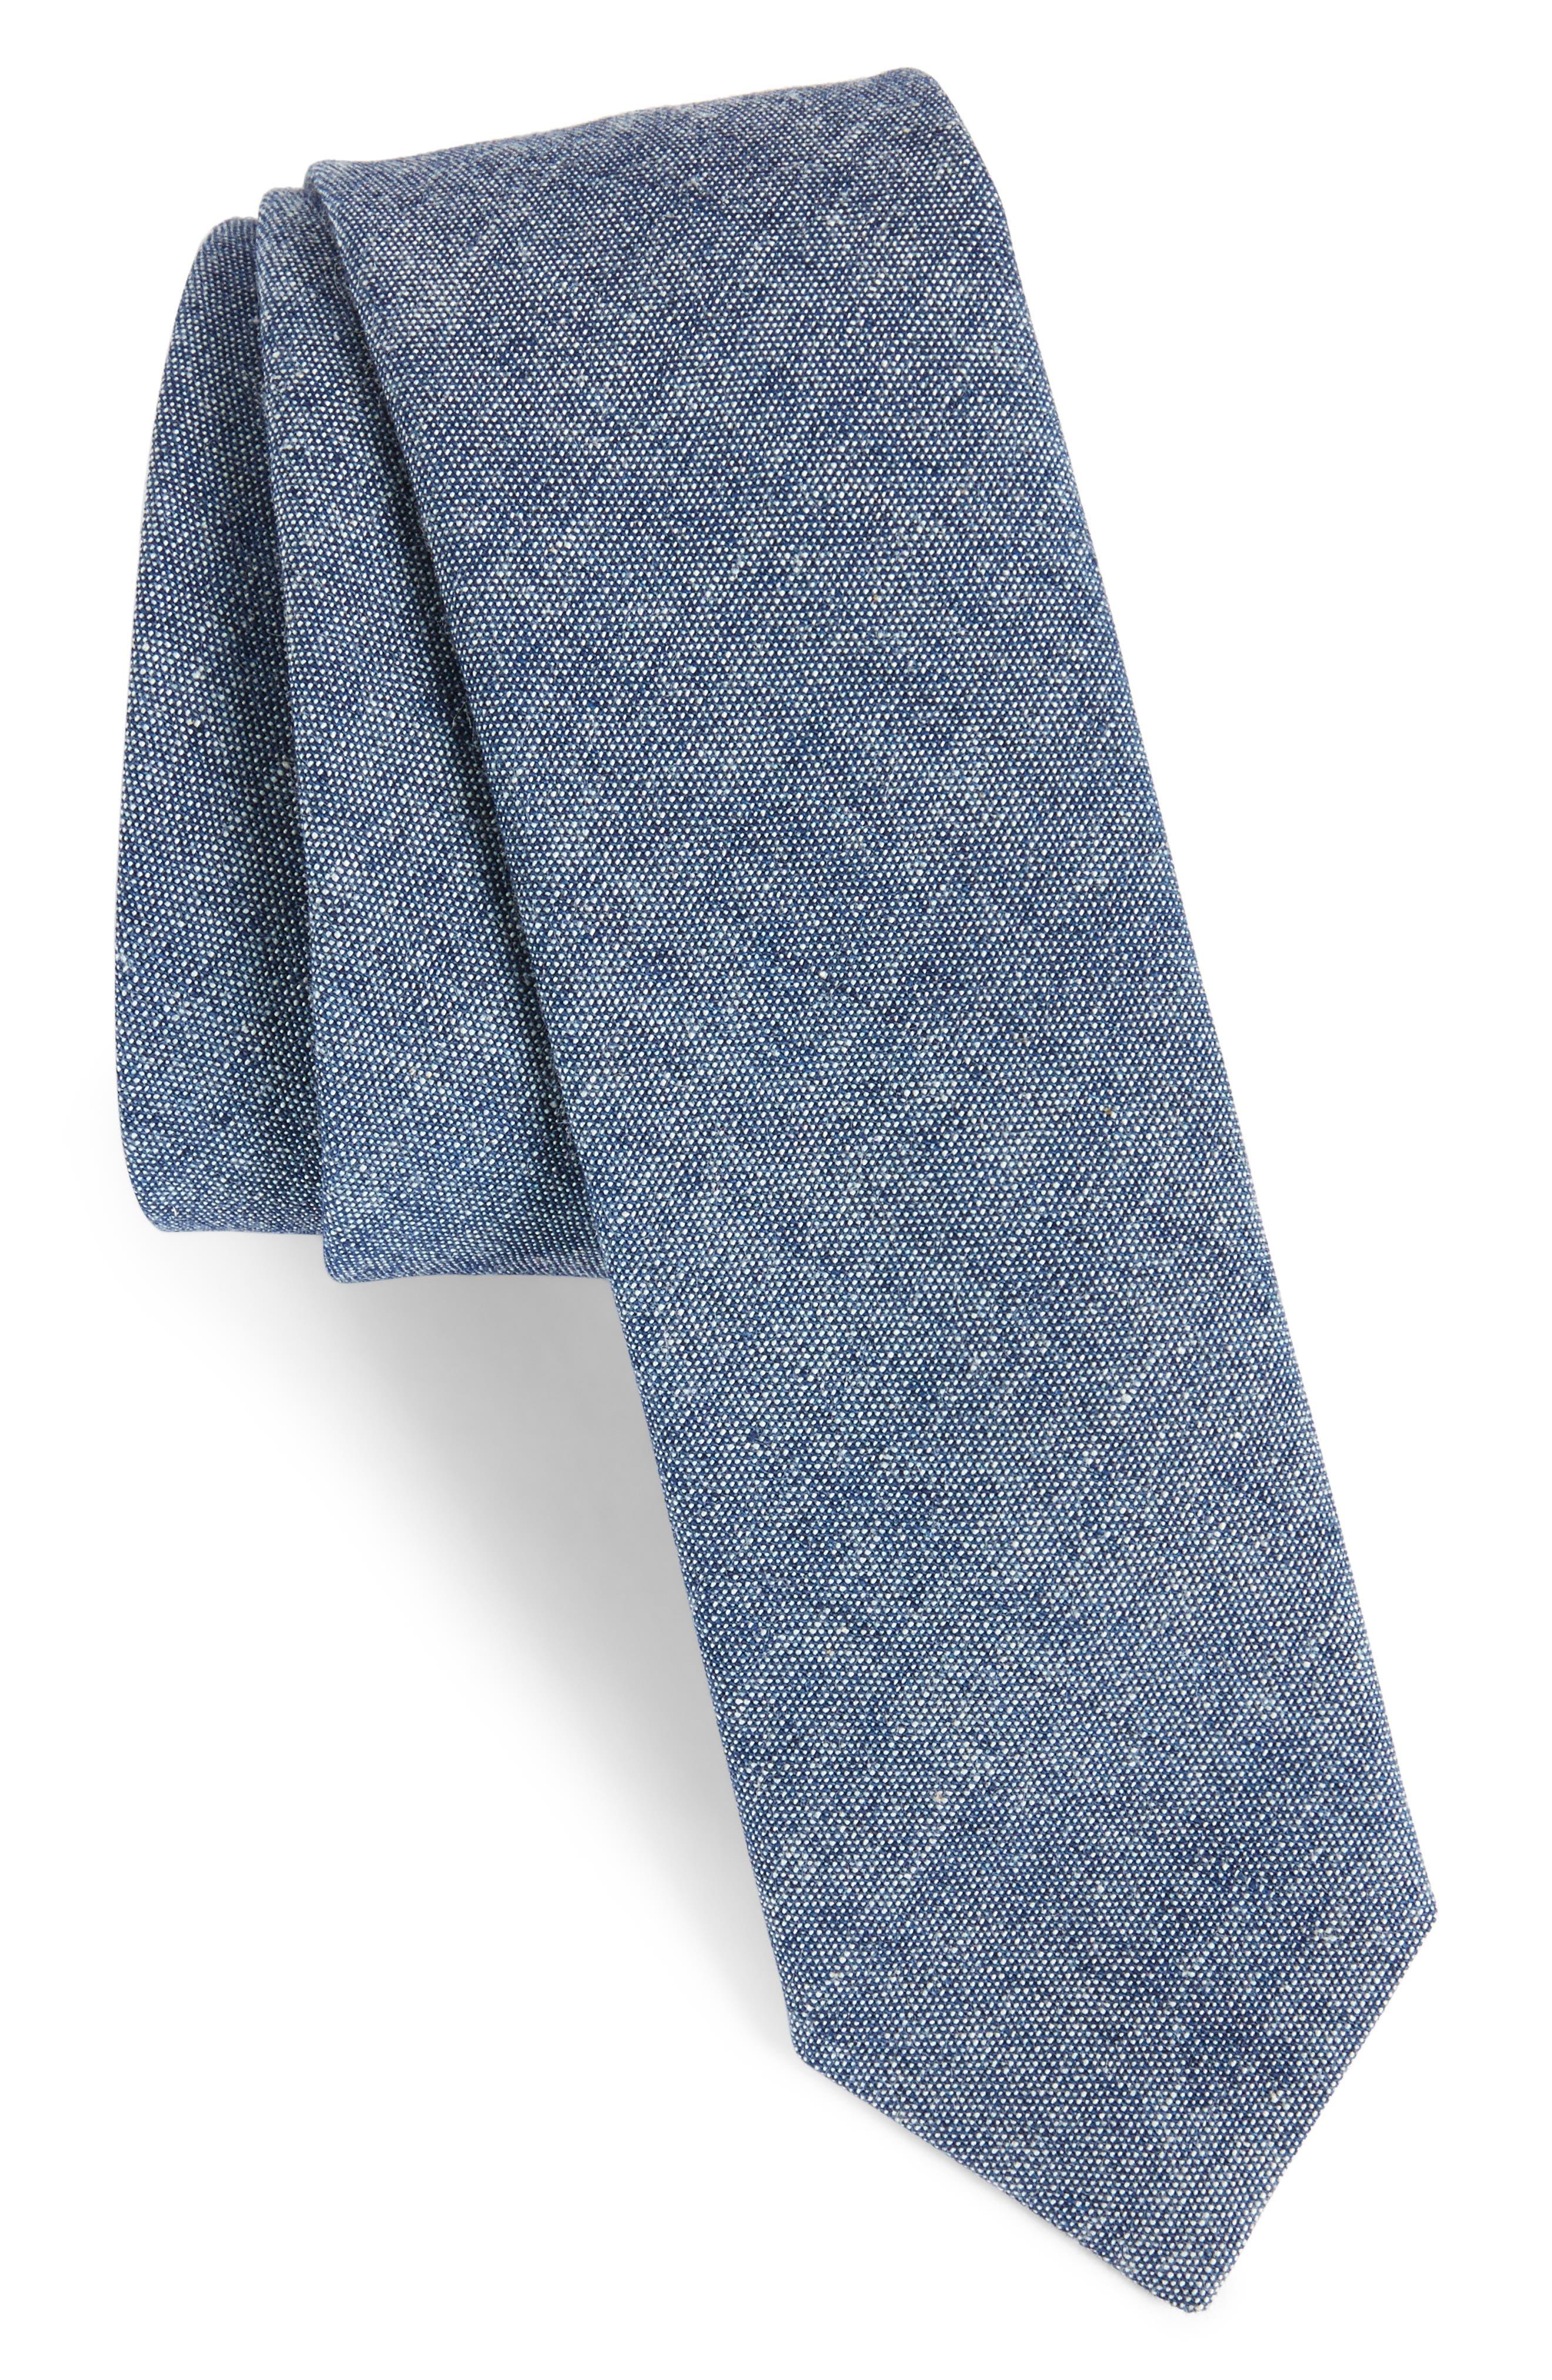 Main Image - Eleventy Marled Cotton Skinny Tie